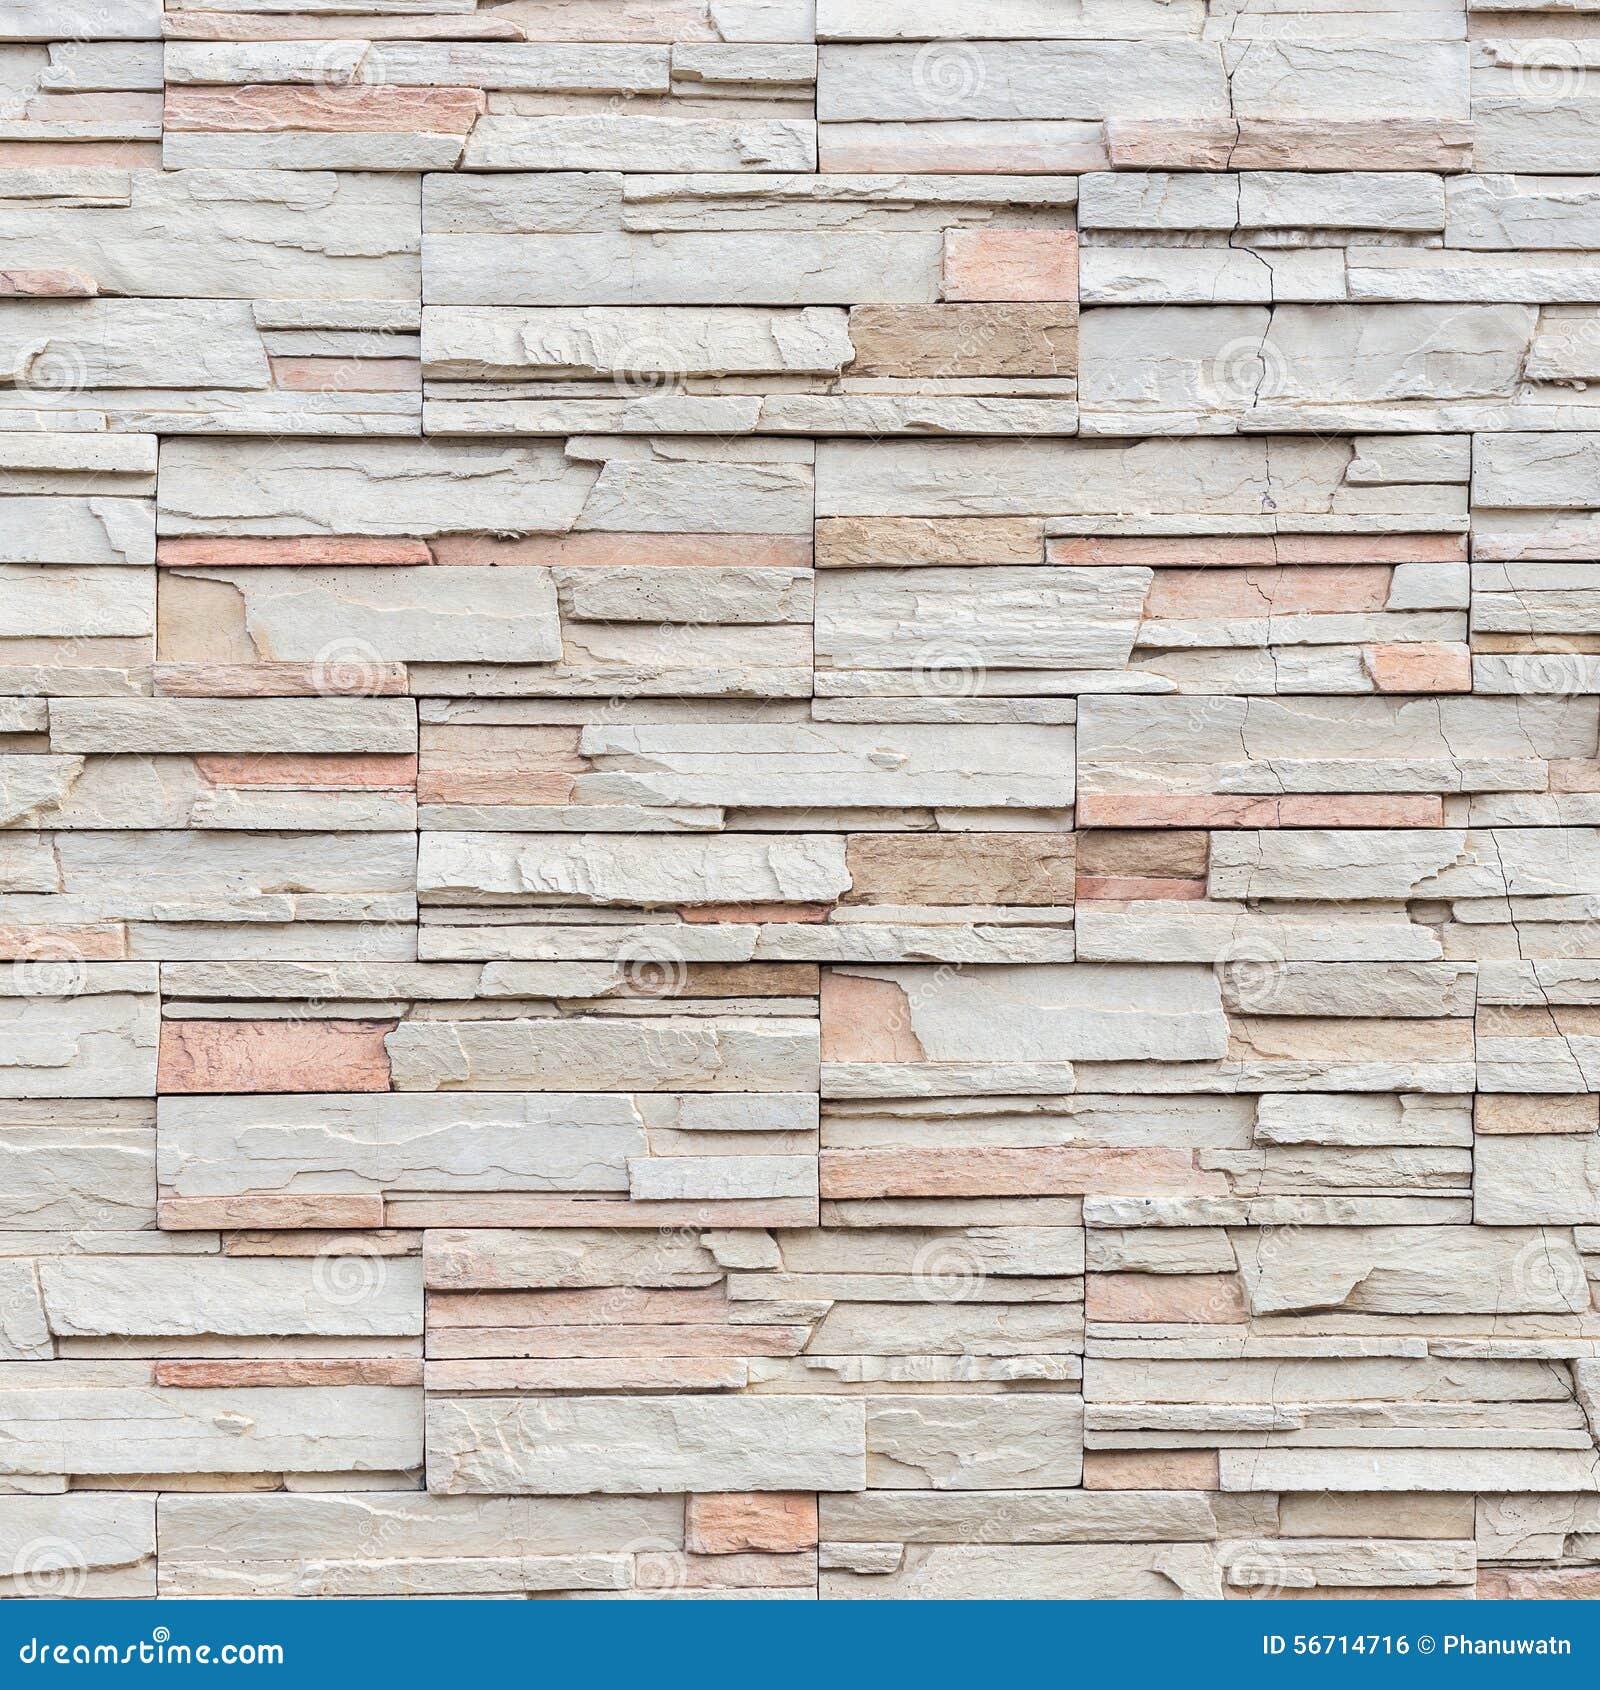 Travertine Stone Wall : Natural travertine stone background stock image